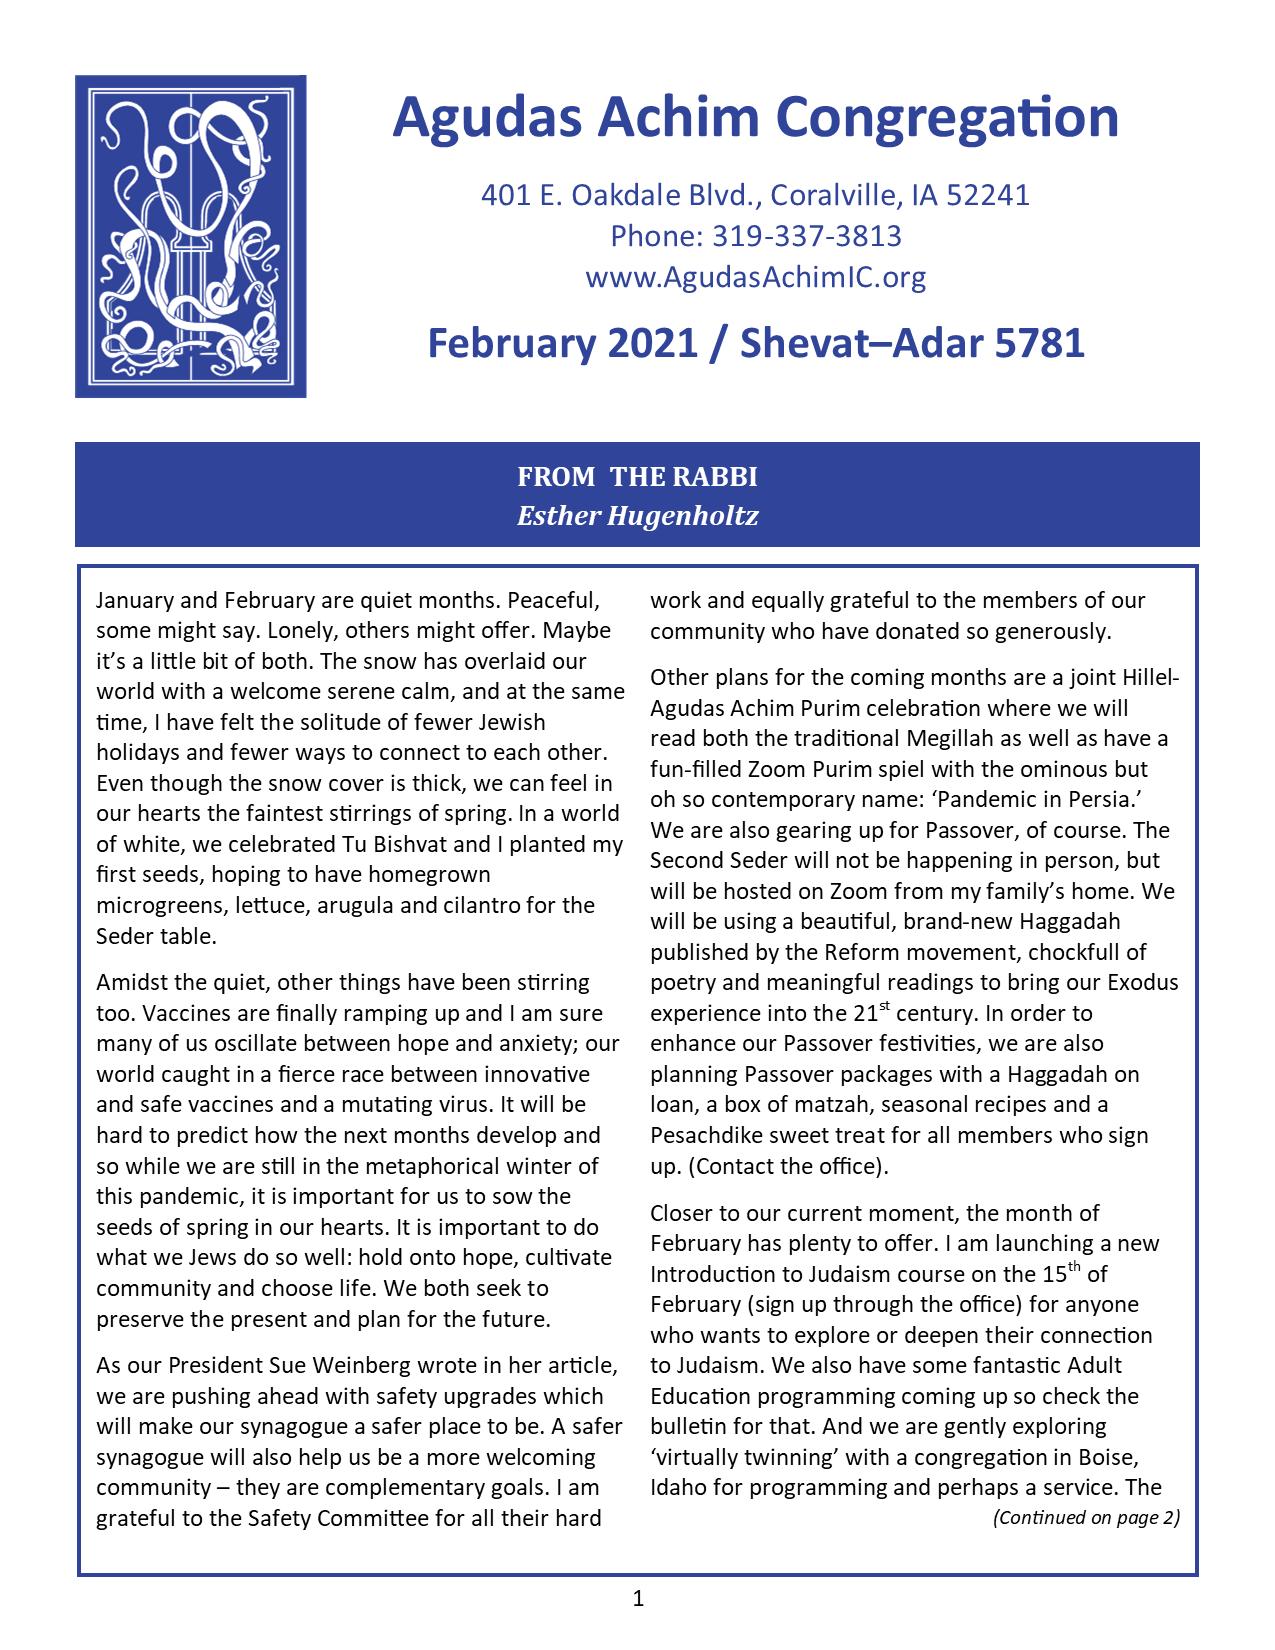 February 2021 Bulletin